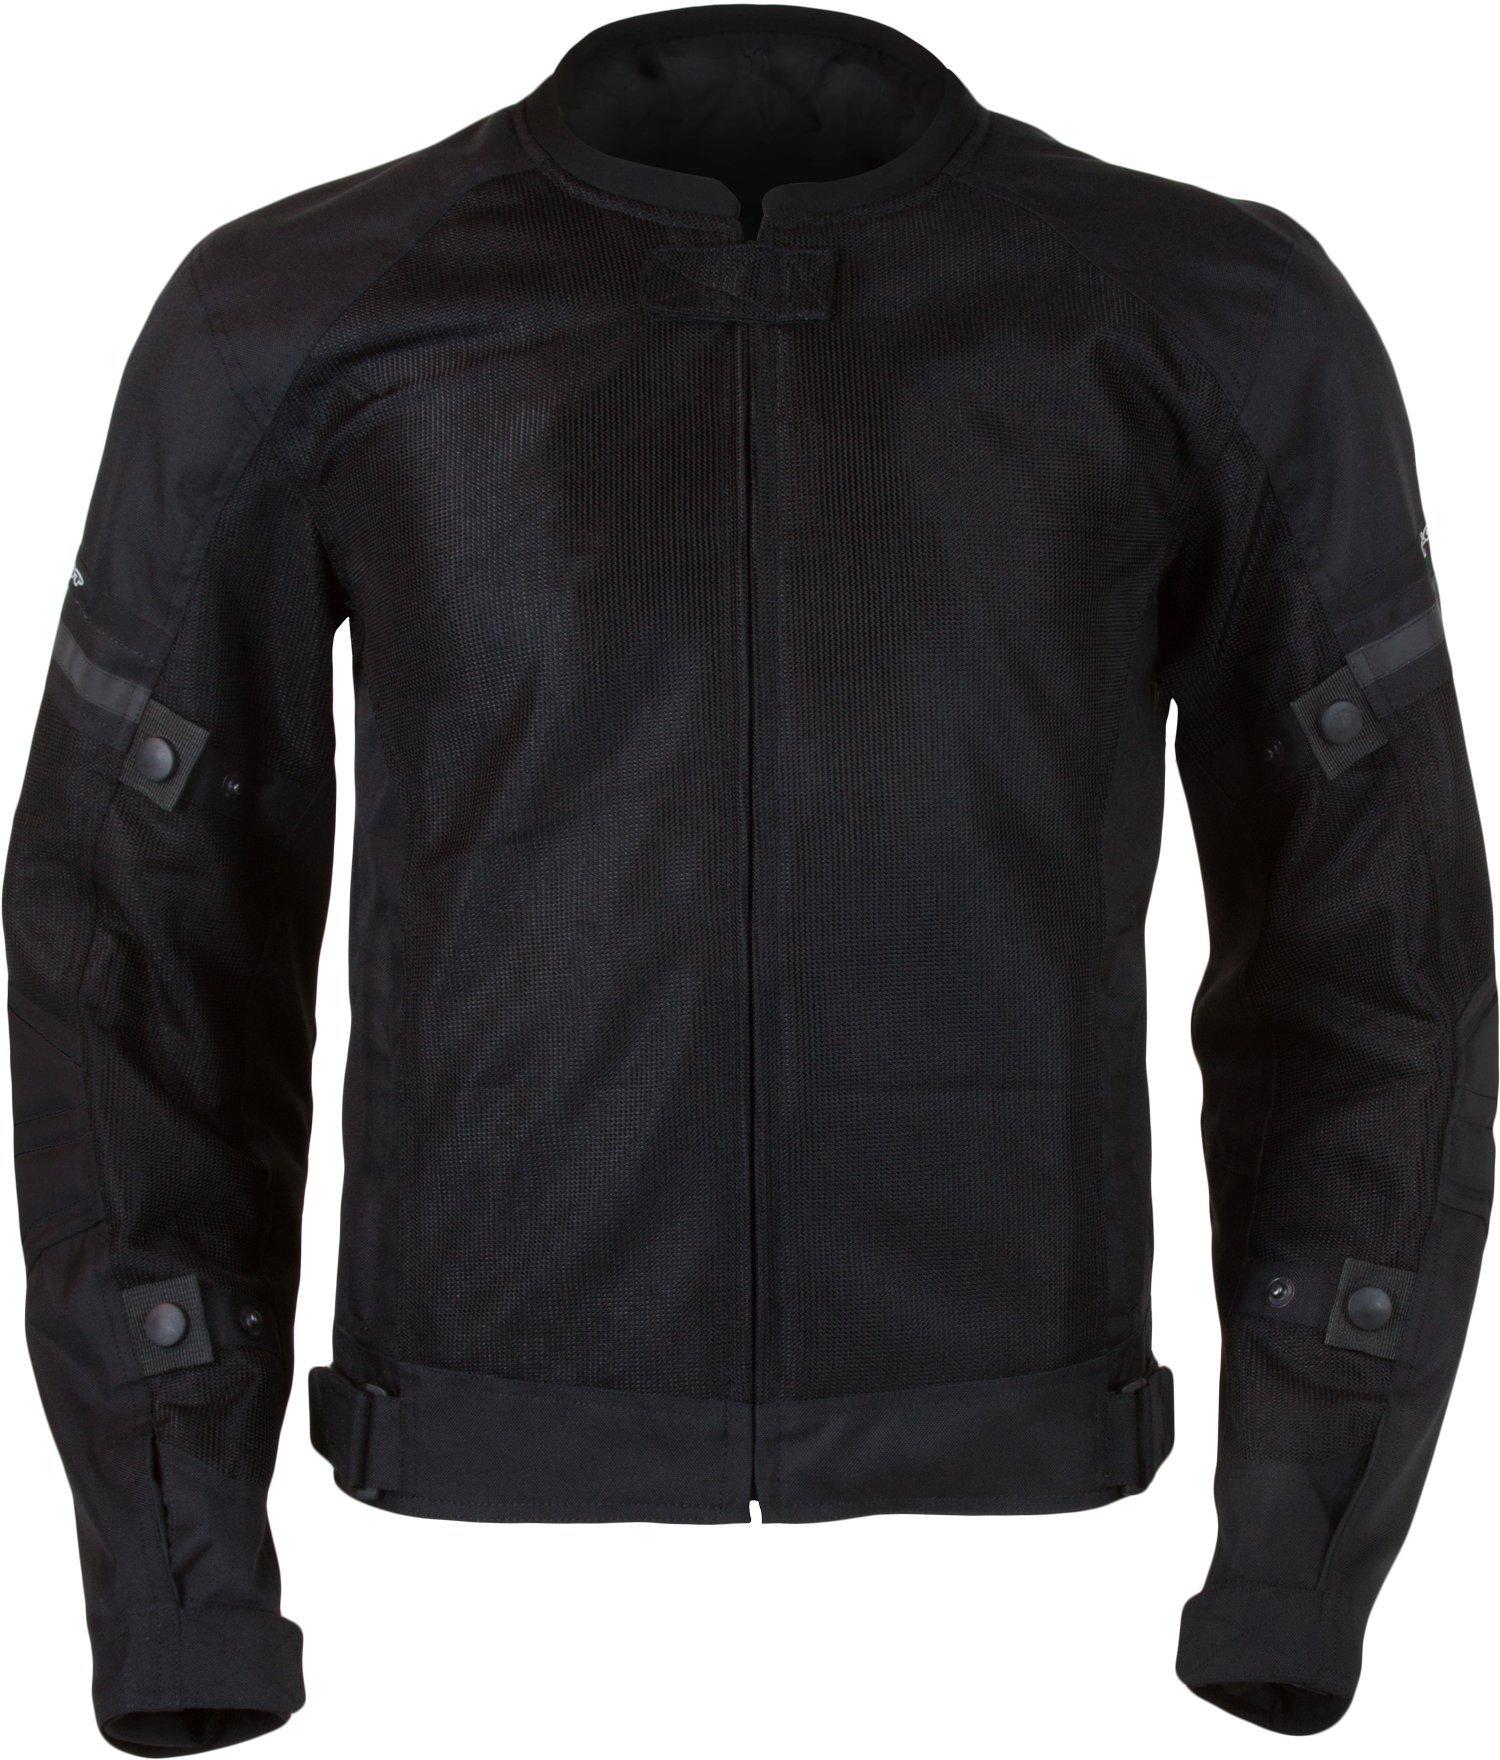 Pilot Motosport Men's Slate Air Jacket (Black, Medium)